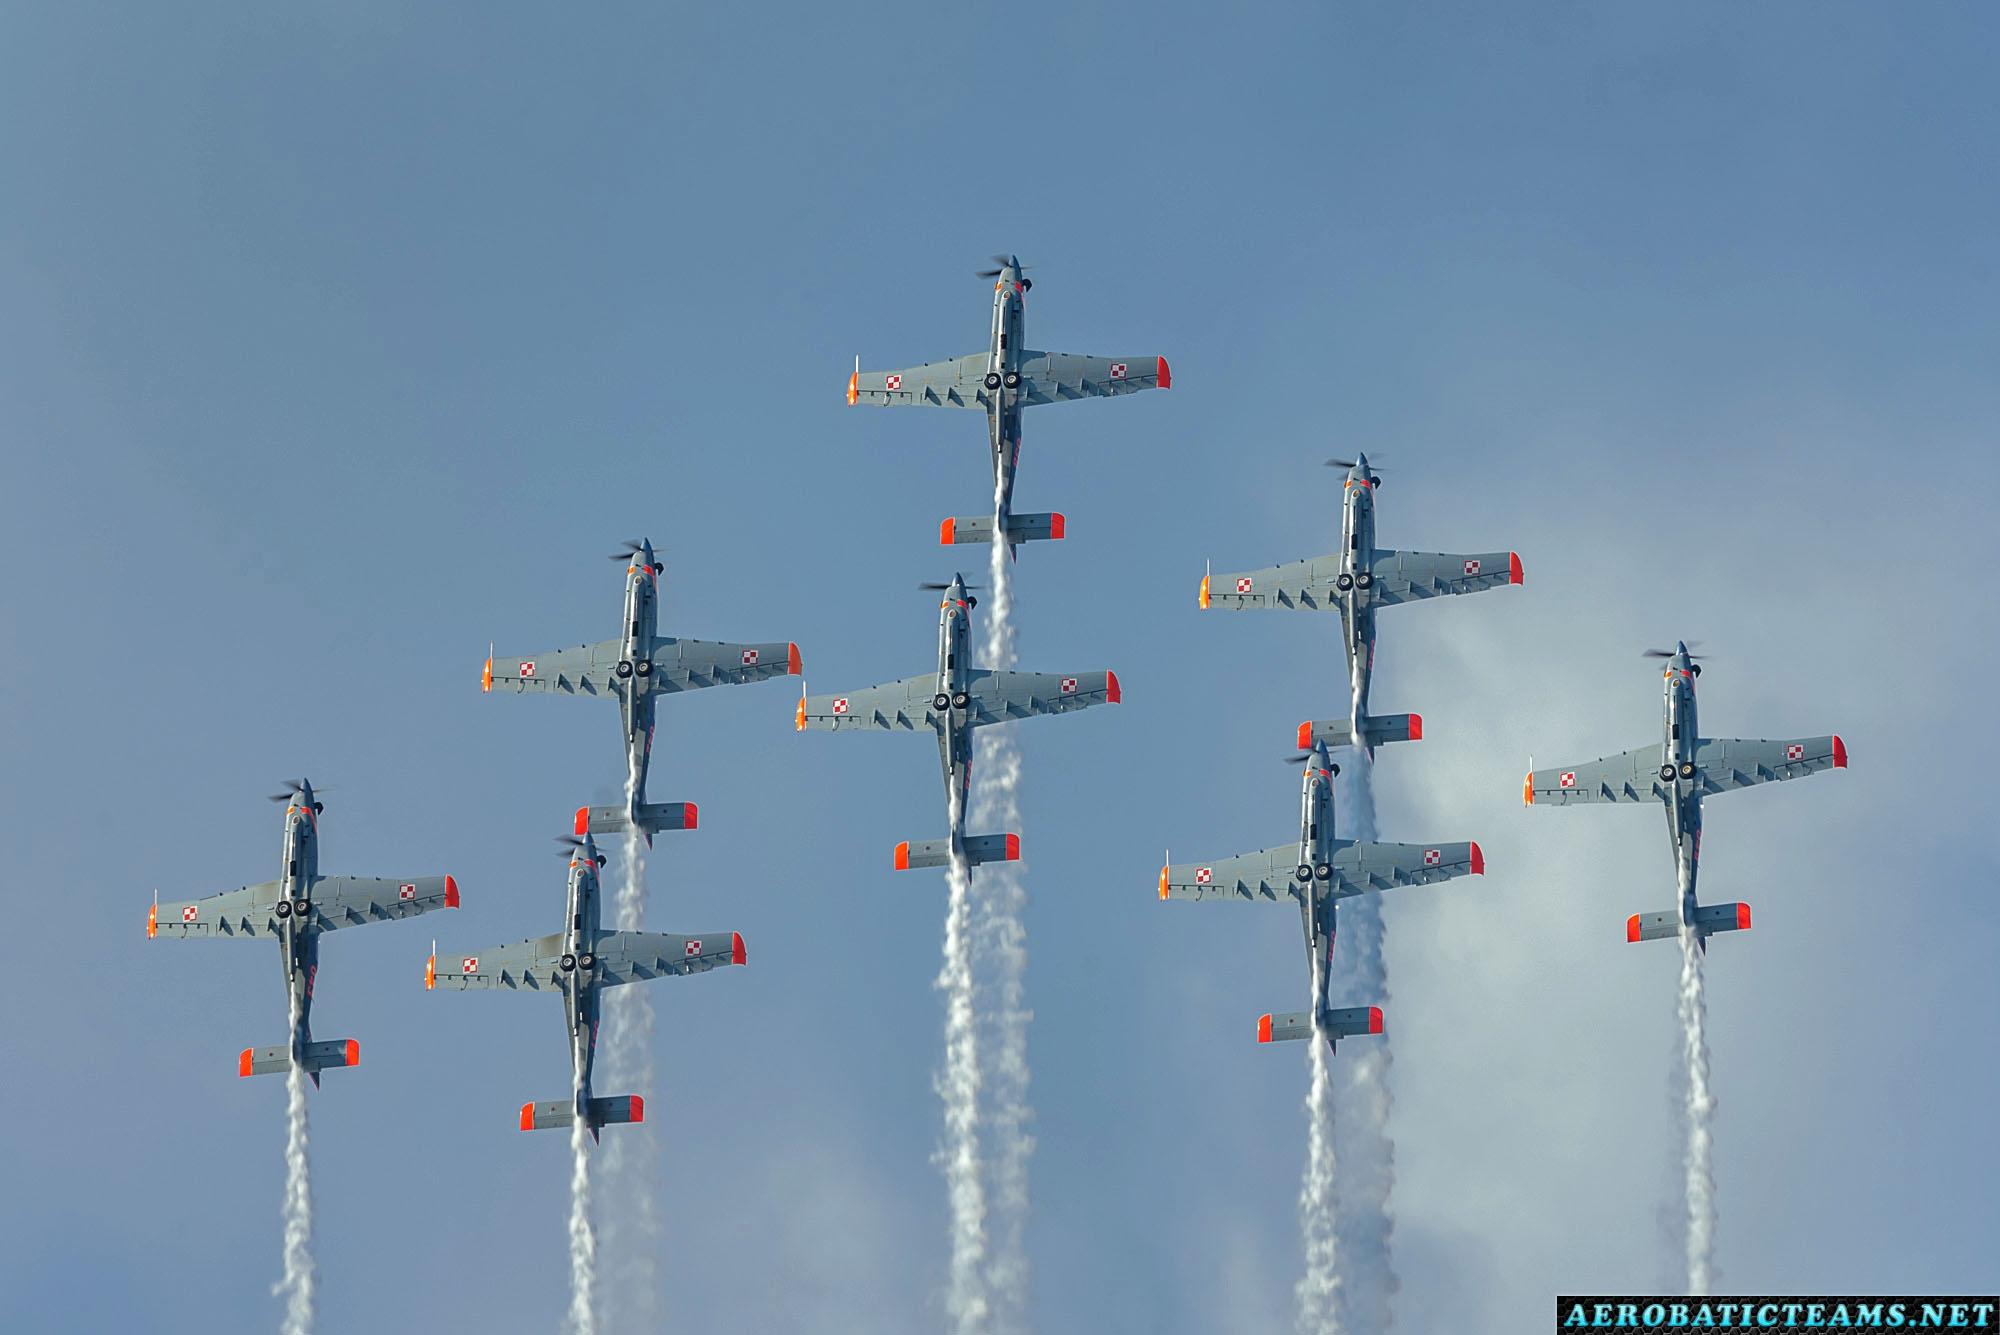 Orlik aerobatic team aircraft will receive major update